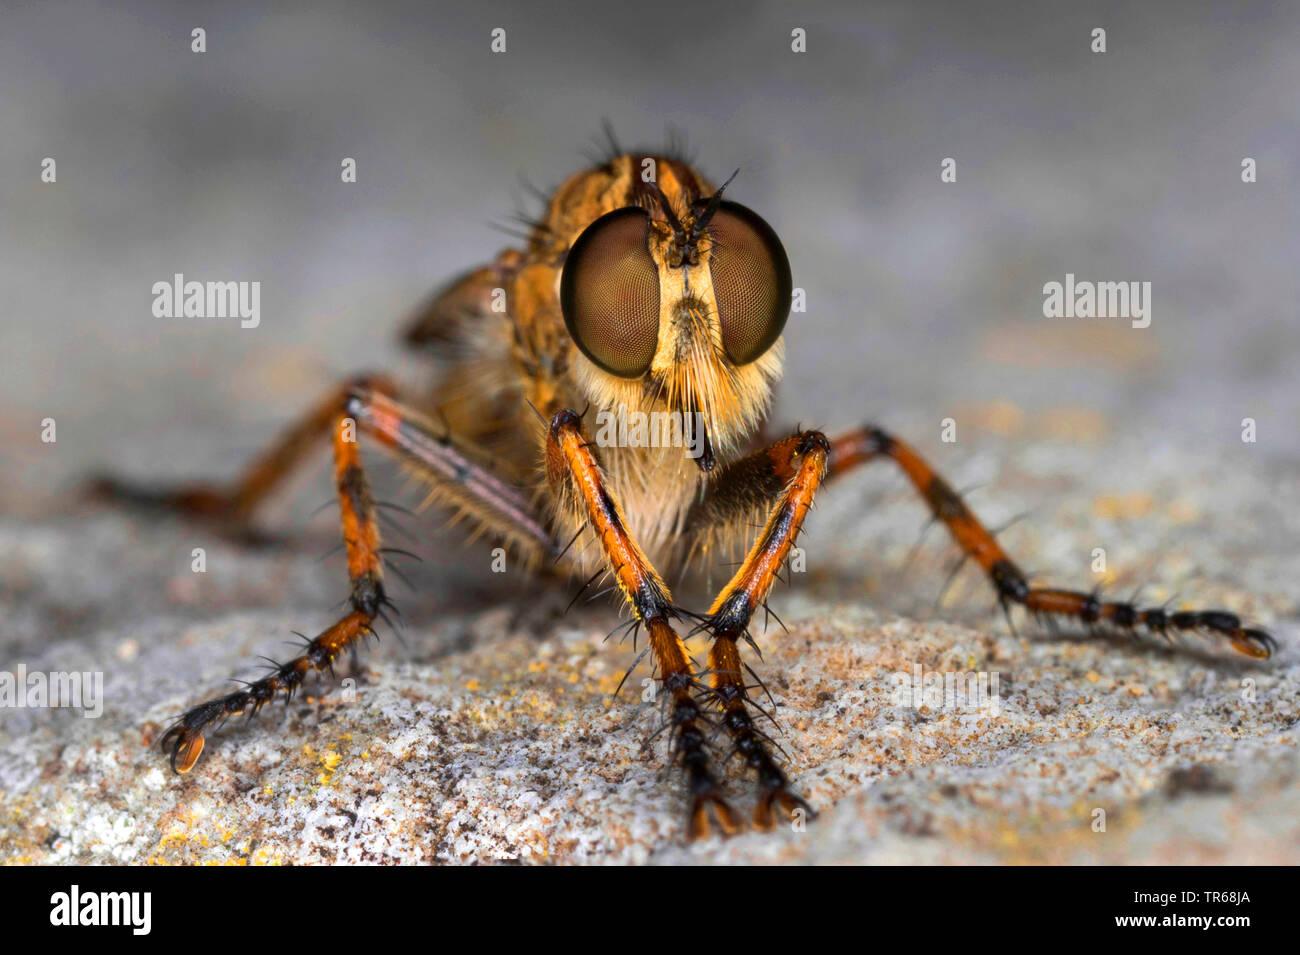 robberfly (Tolmerus cingulatus), compound eyes, front view, Germany, Mecklenburg-Western Pomerania - Stock Image